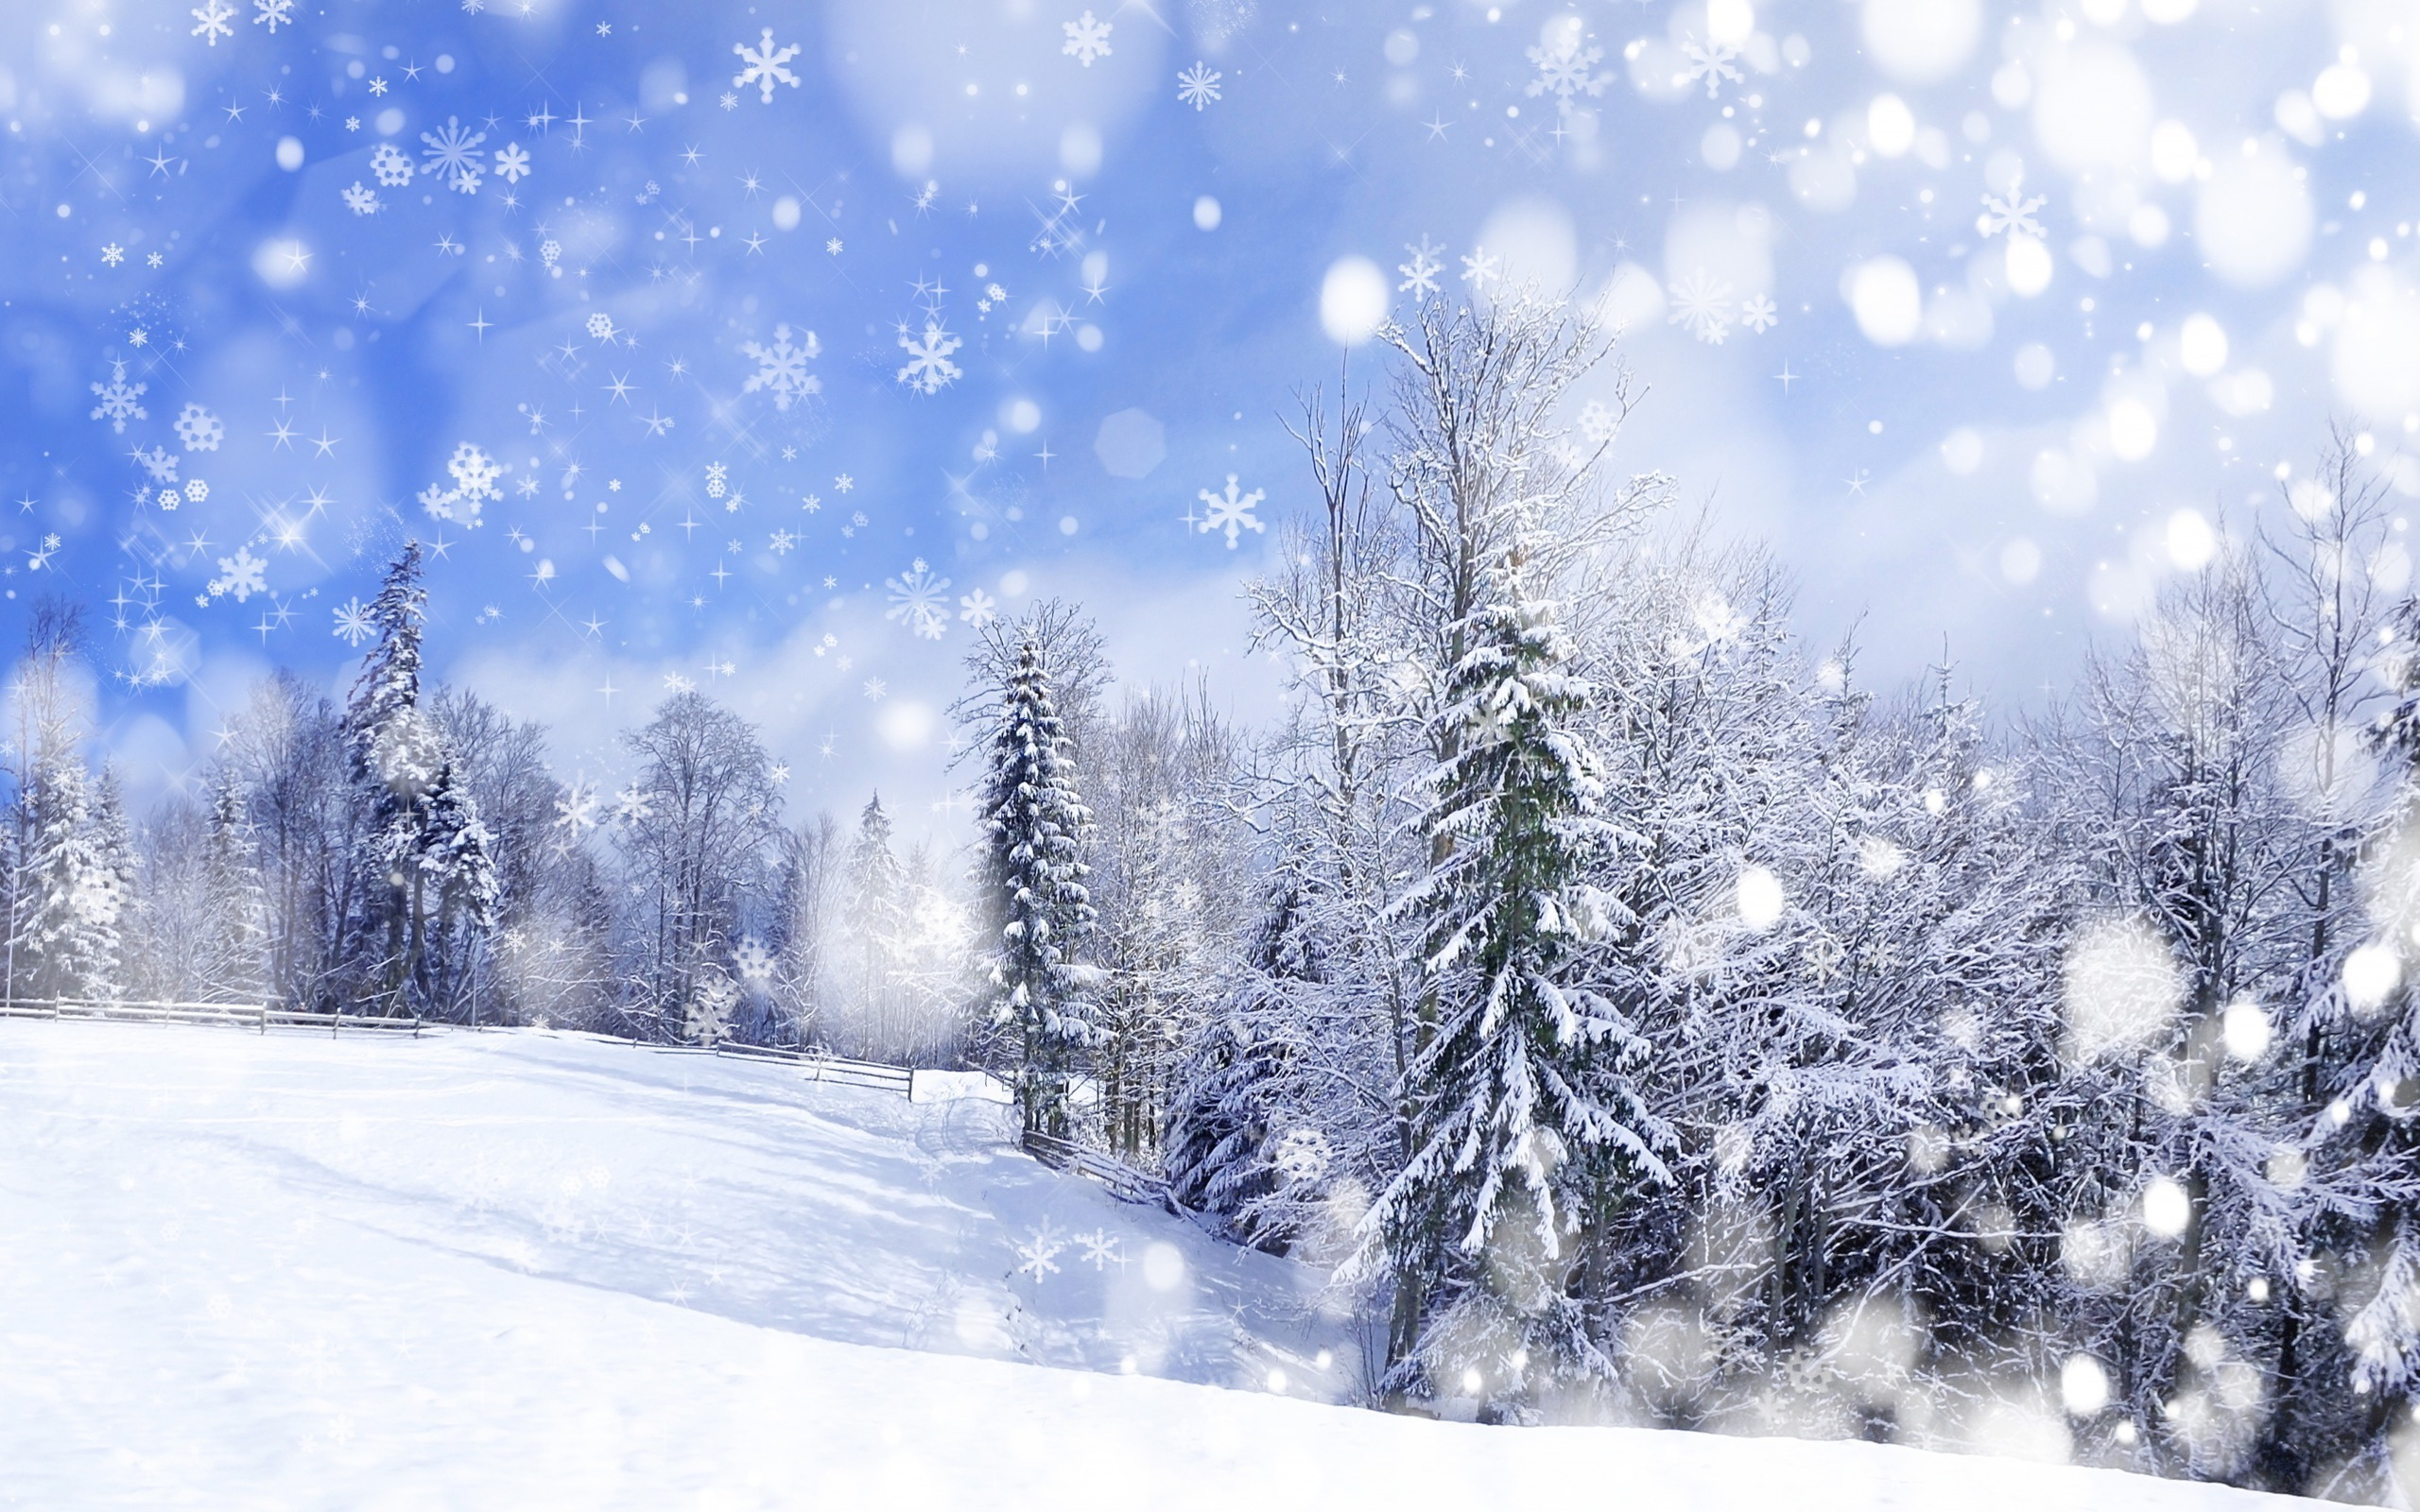 Winter Wallpapers HD 2560x1600